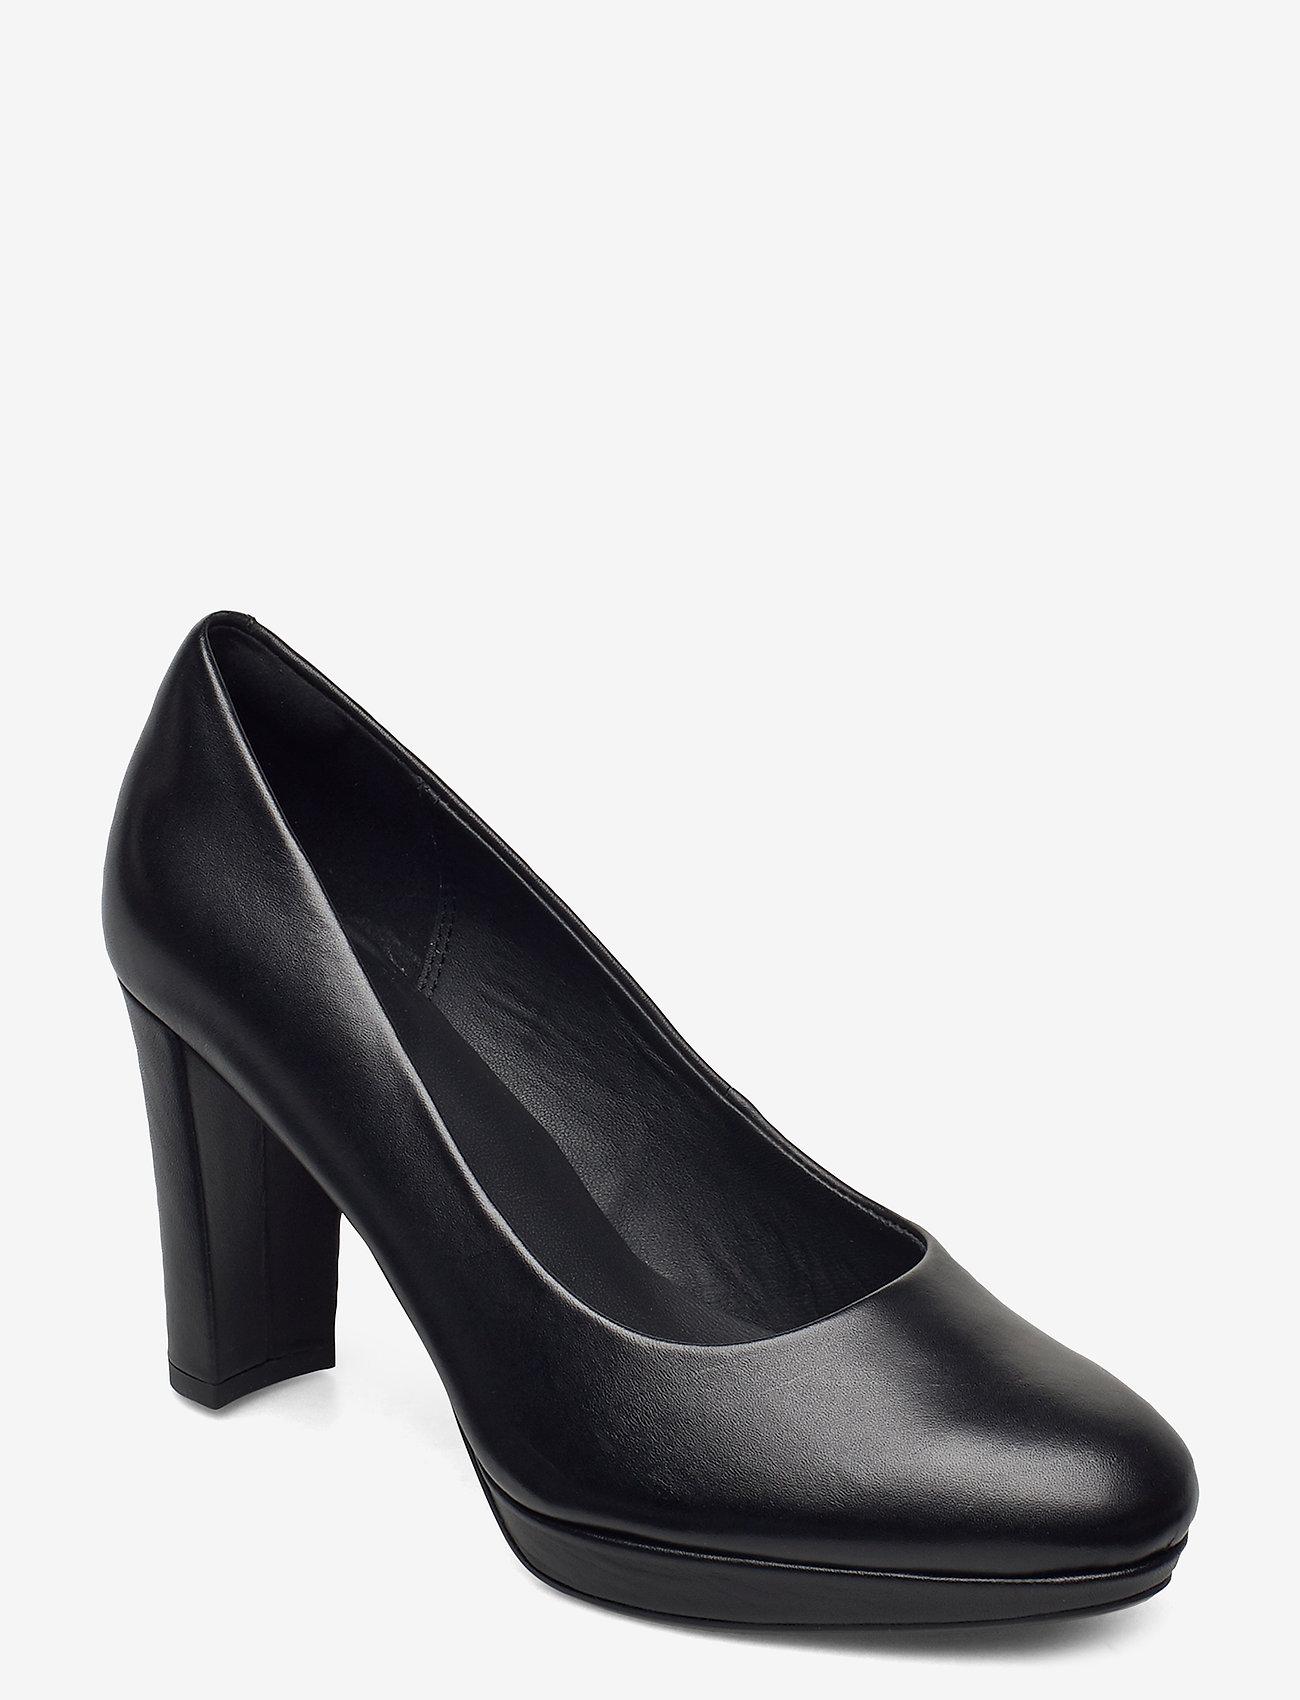 Clarks - Kendra Sienna - klassiska pumps - black - 0